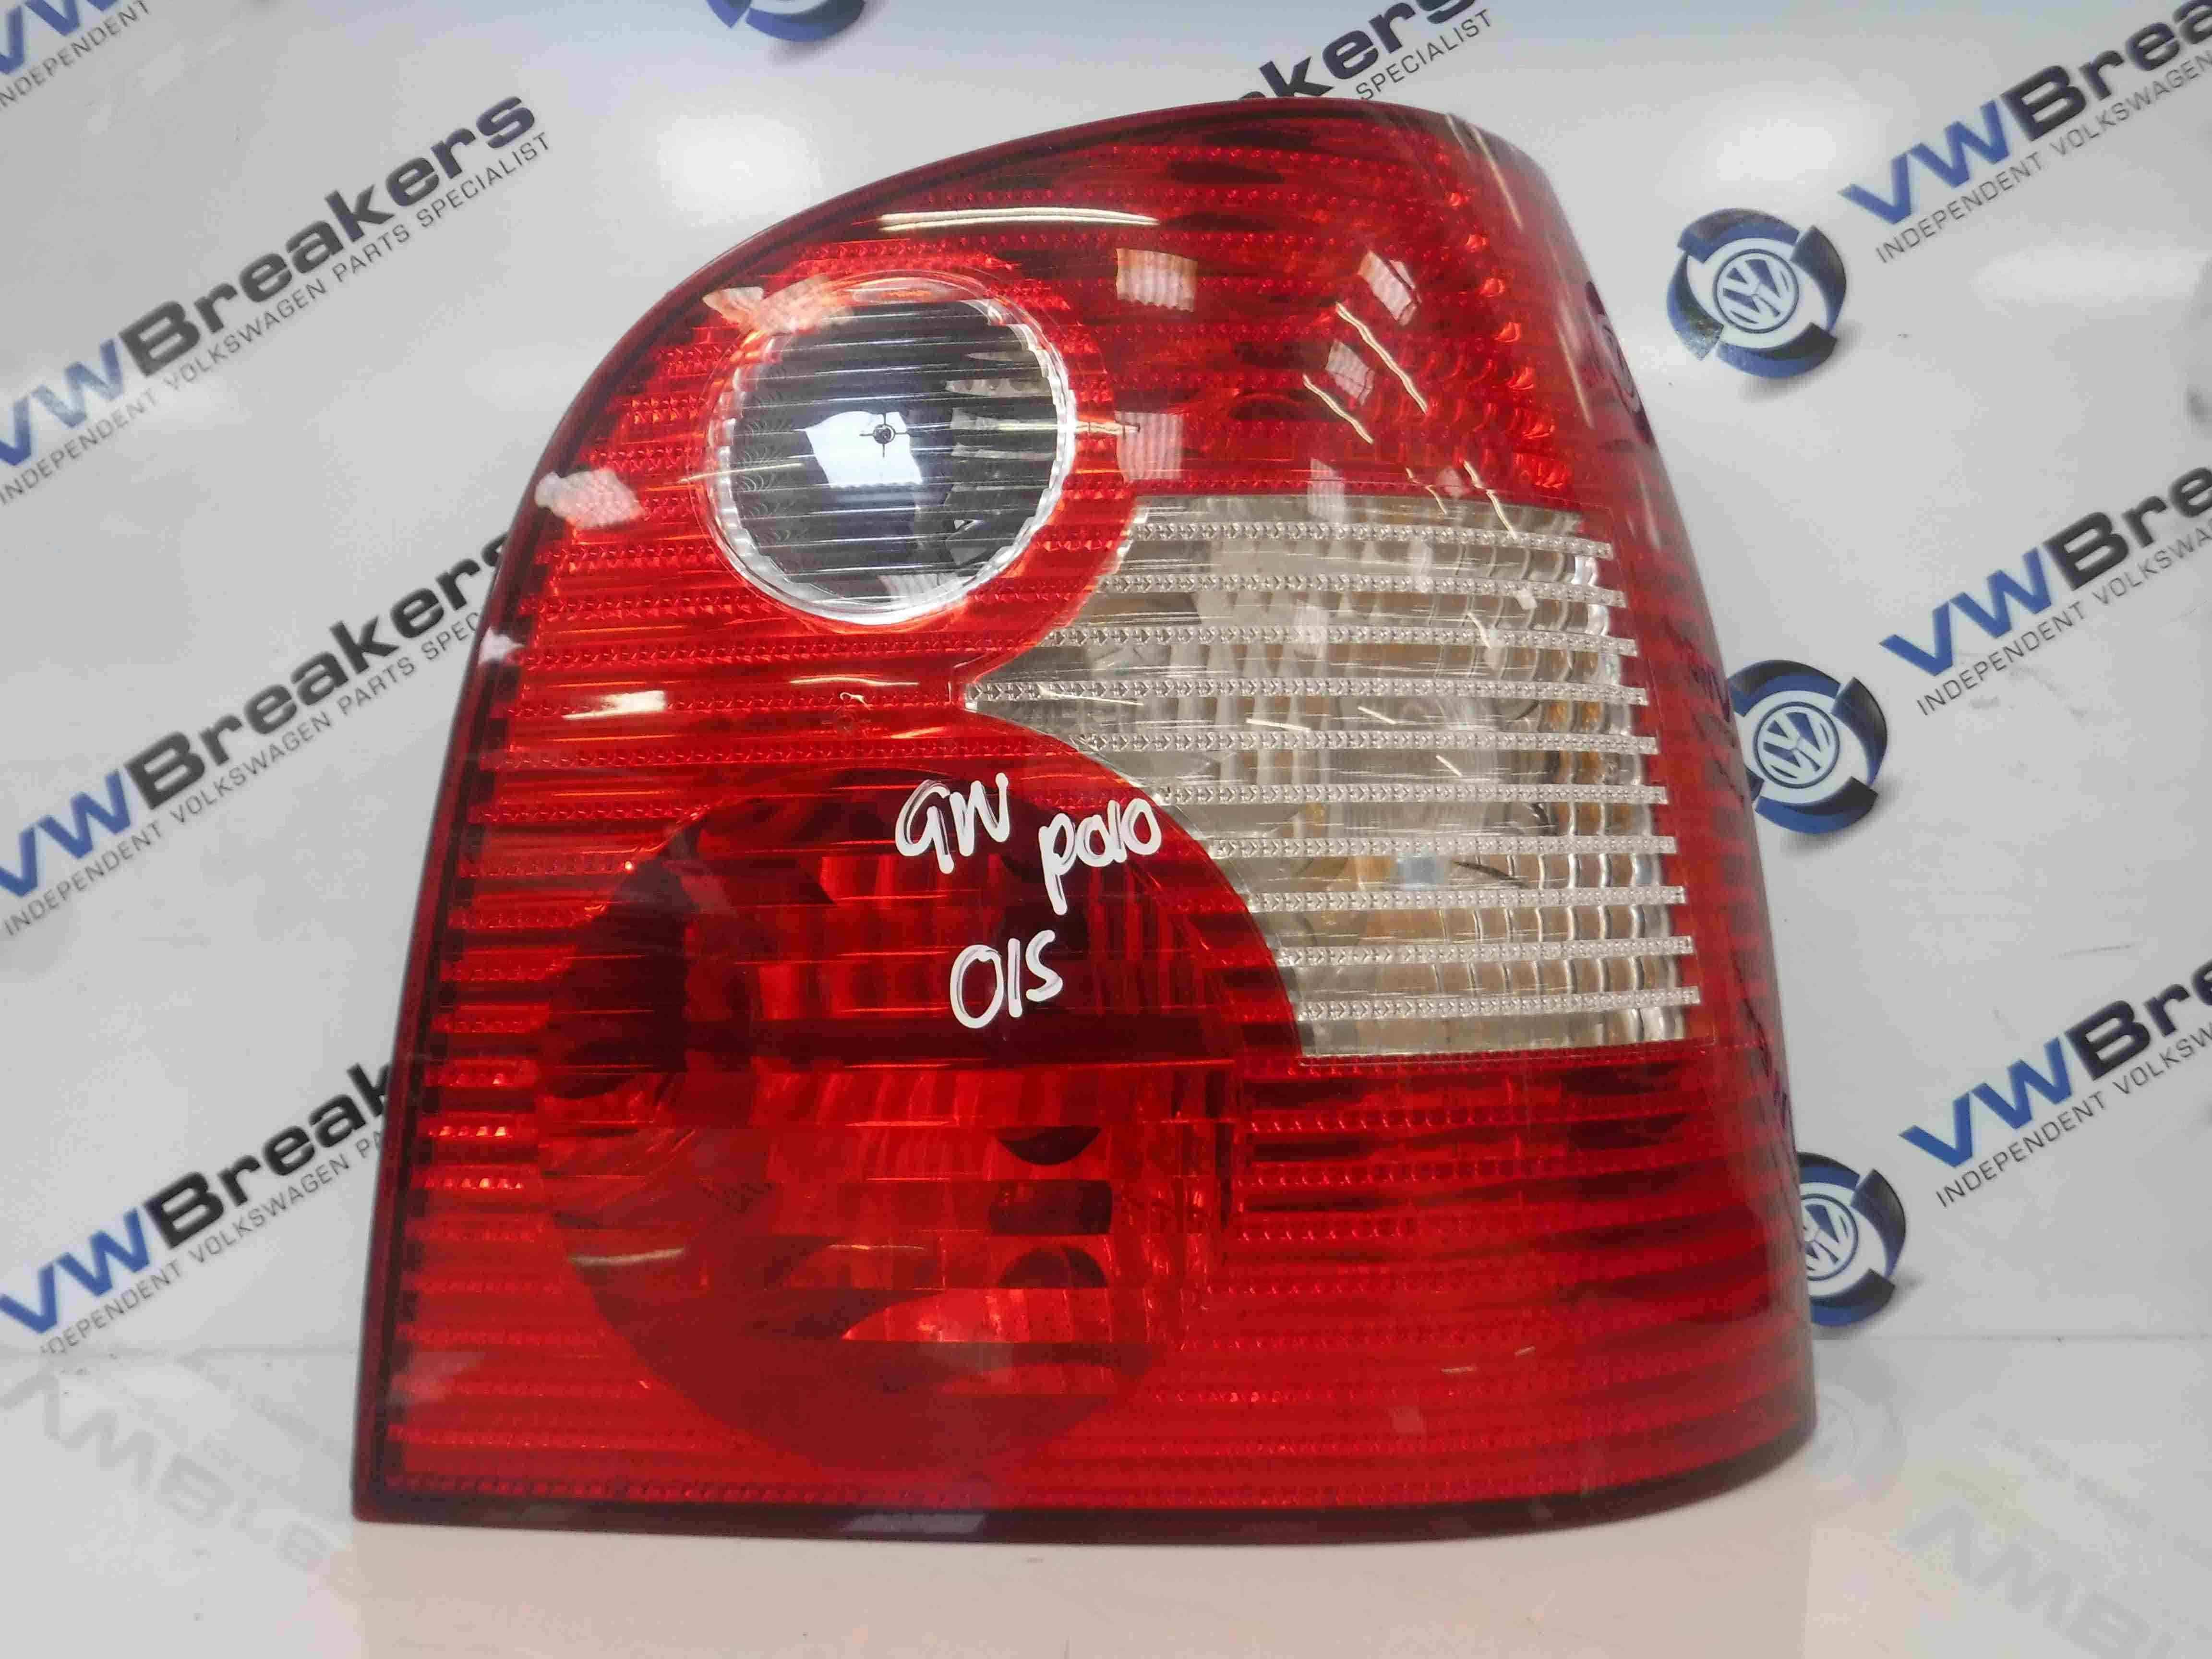 Volkswagen Polo 2003-2006 9N Drivers OSR Rear Light Lens 6Q6945112a